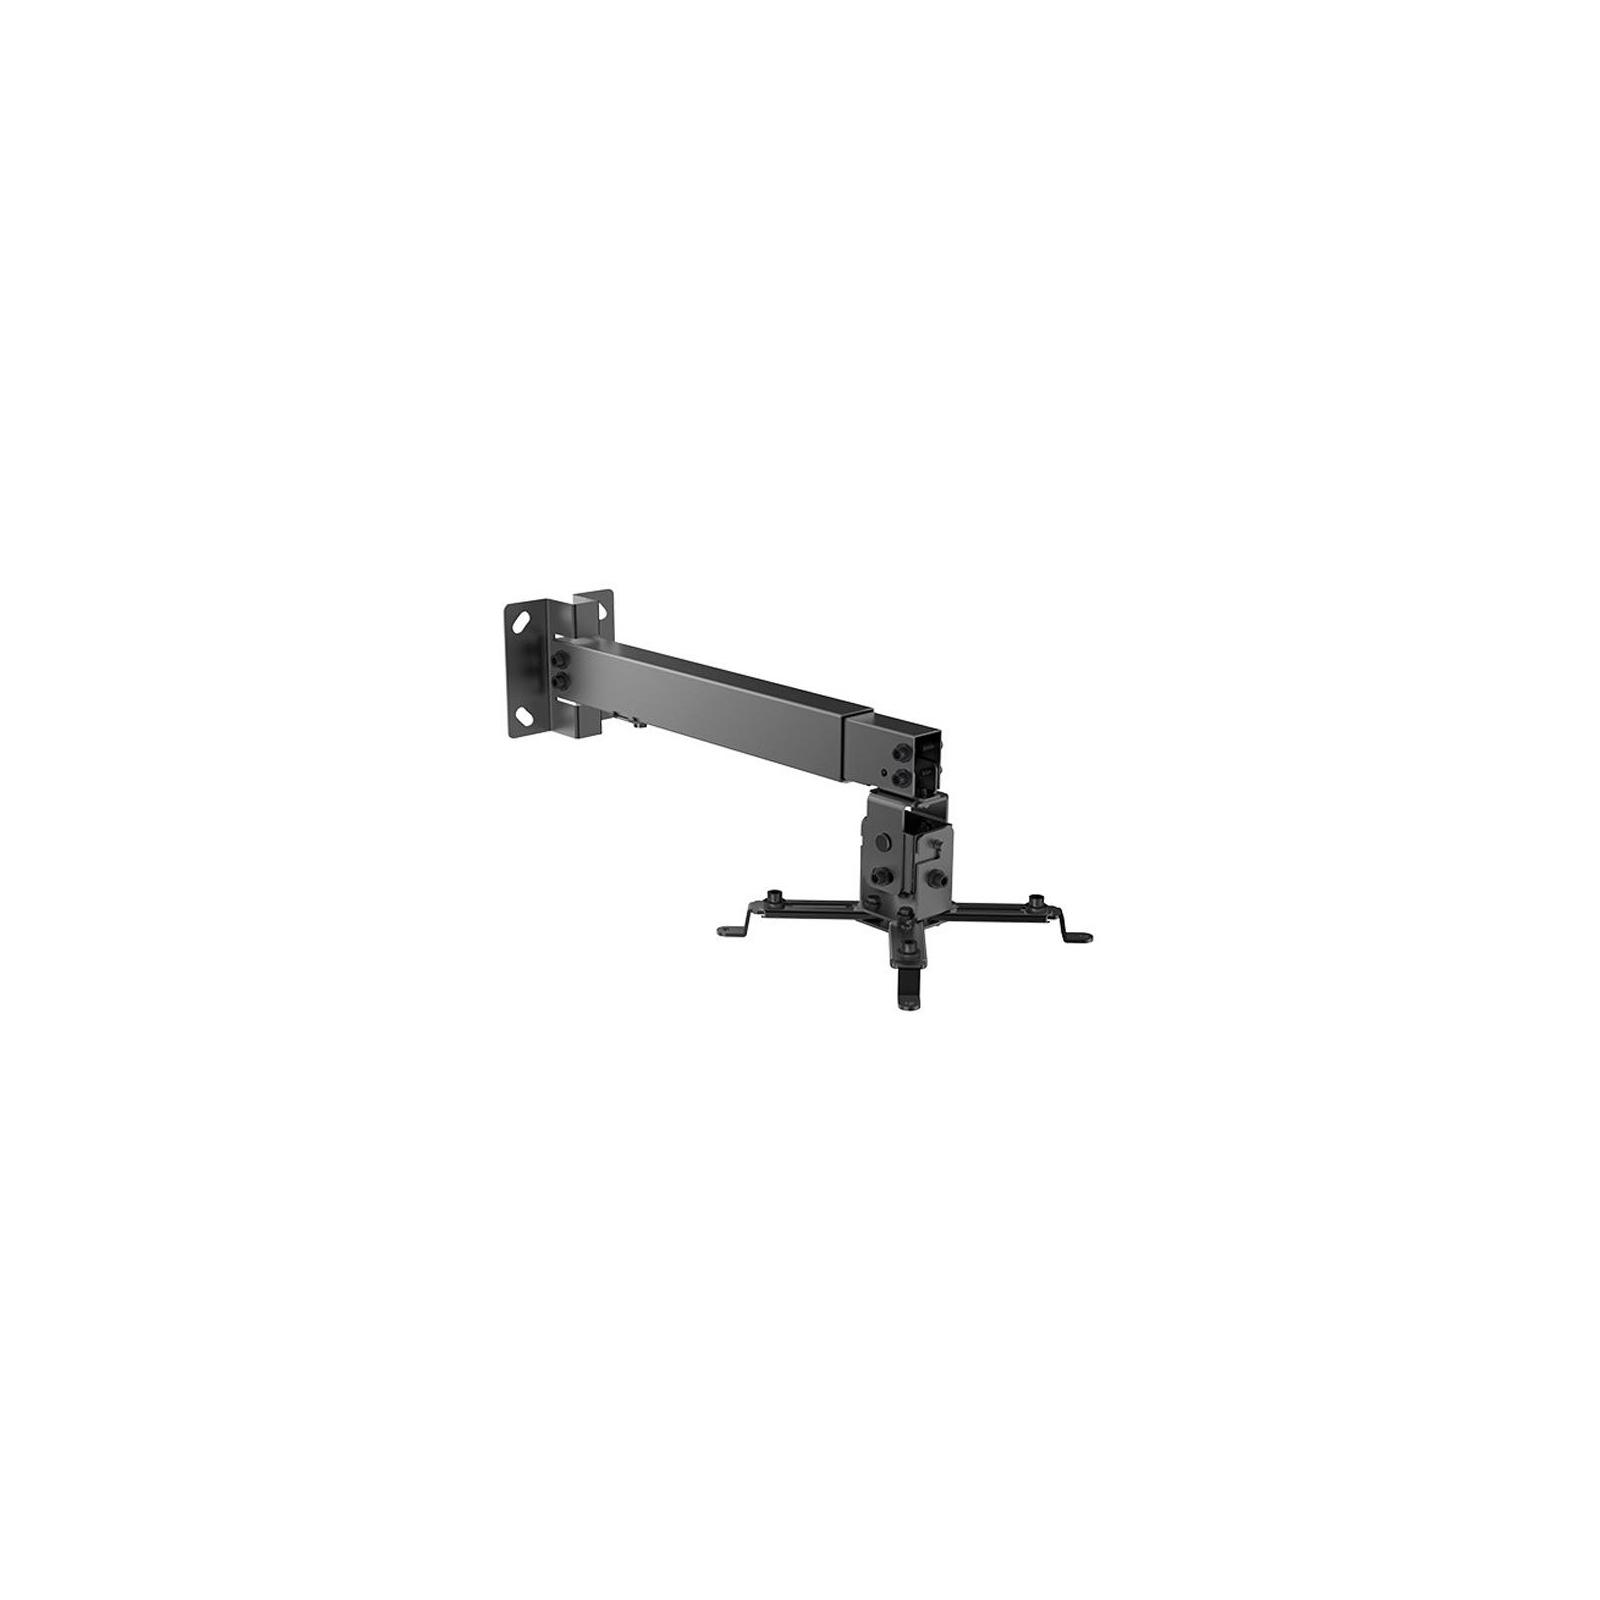 Кронштейн для проектора BRATECK PRB-2G BLACK изображение 2